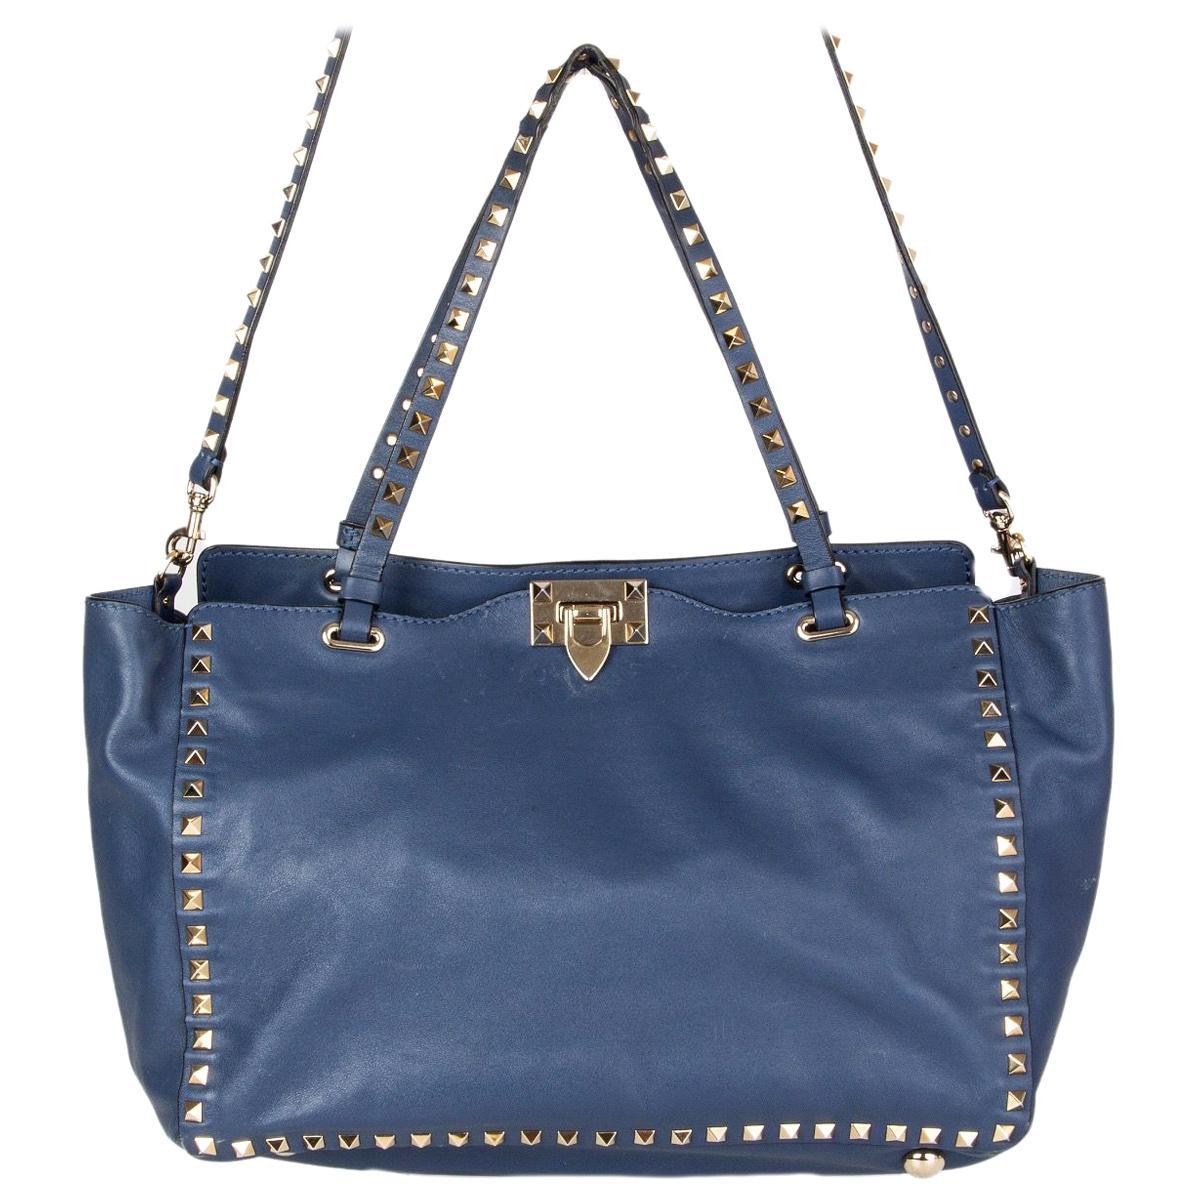 VALENTINO air force blue leather ROCKSTUD MEDIUM TOTE Shoulder Bag